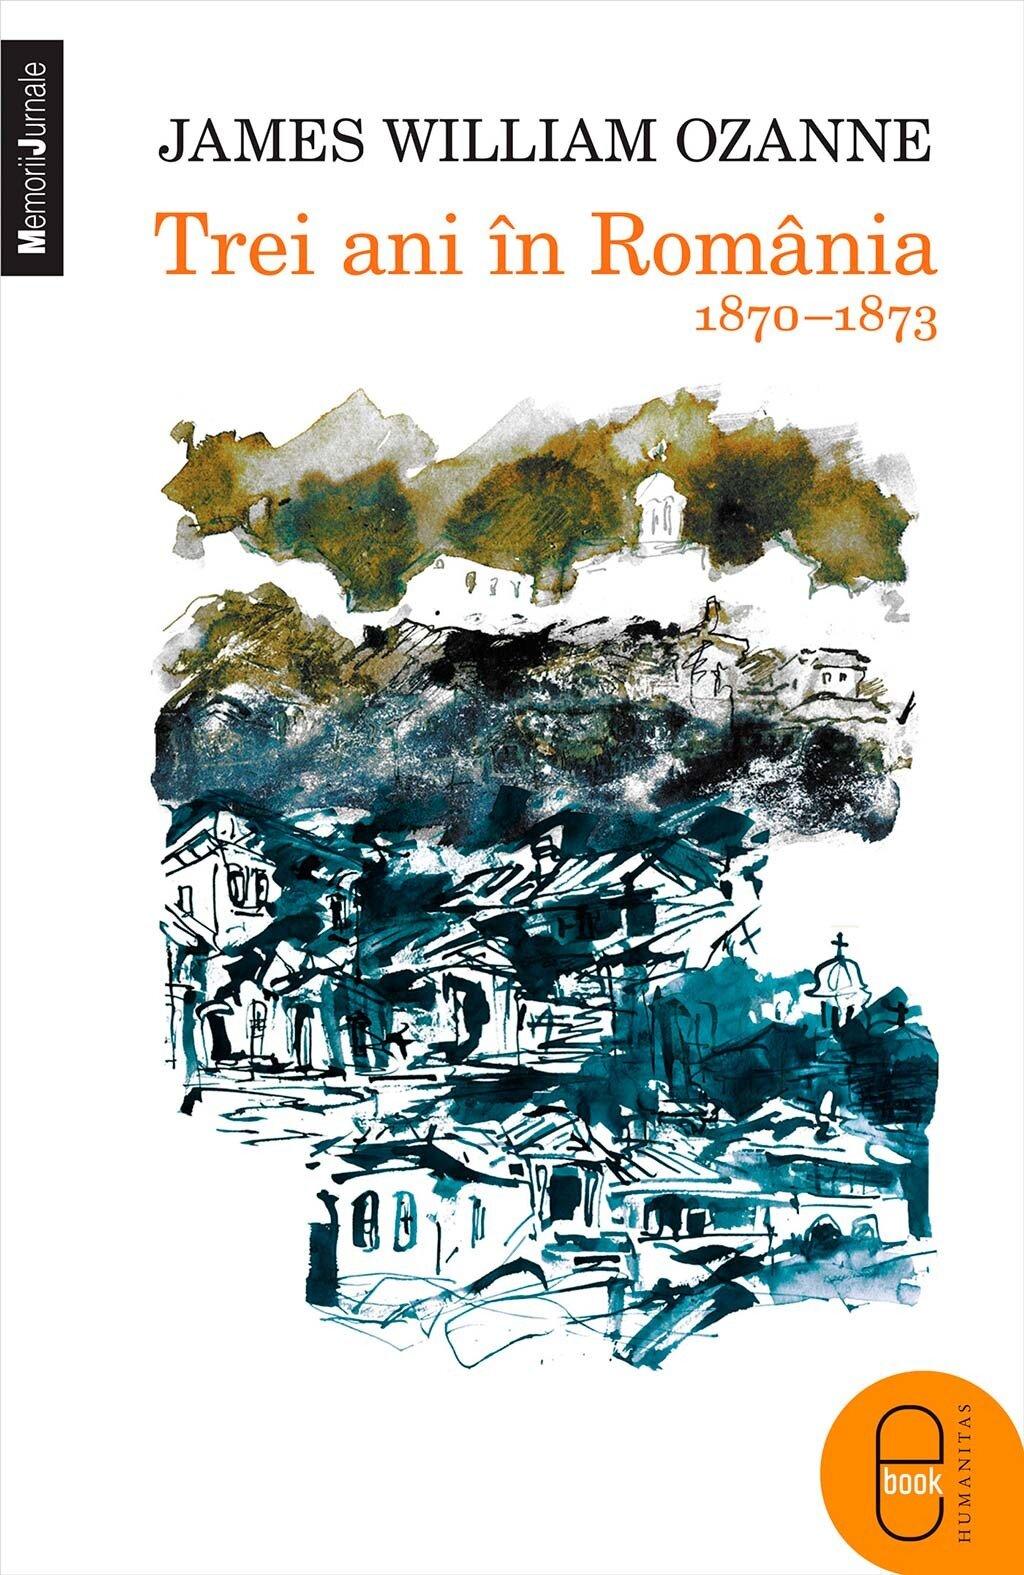 Trei ani in Romania (1870-1873) PDF (Download eBook)